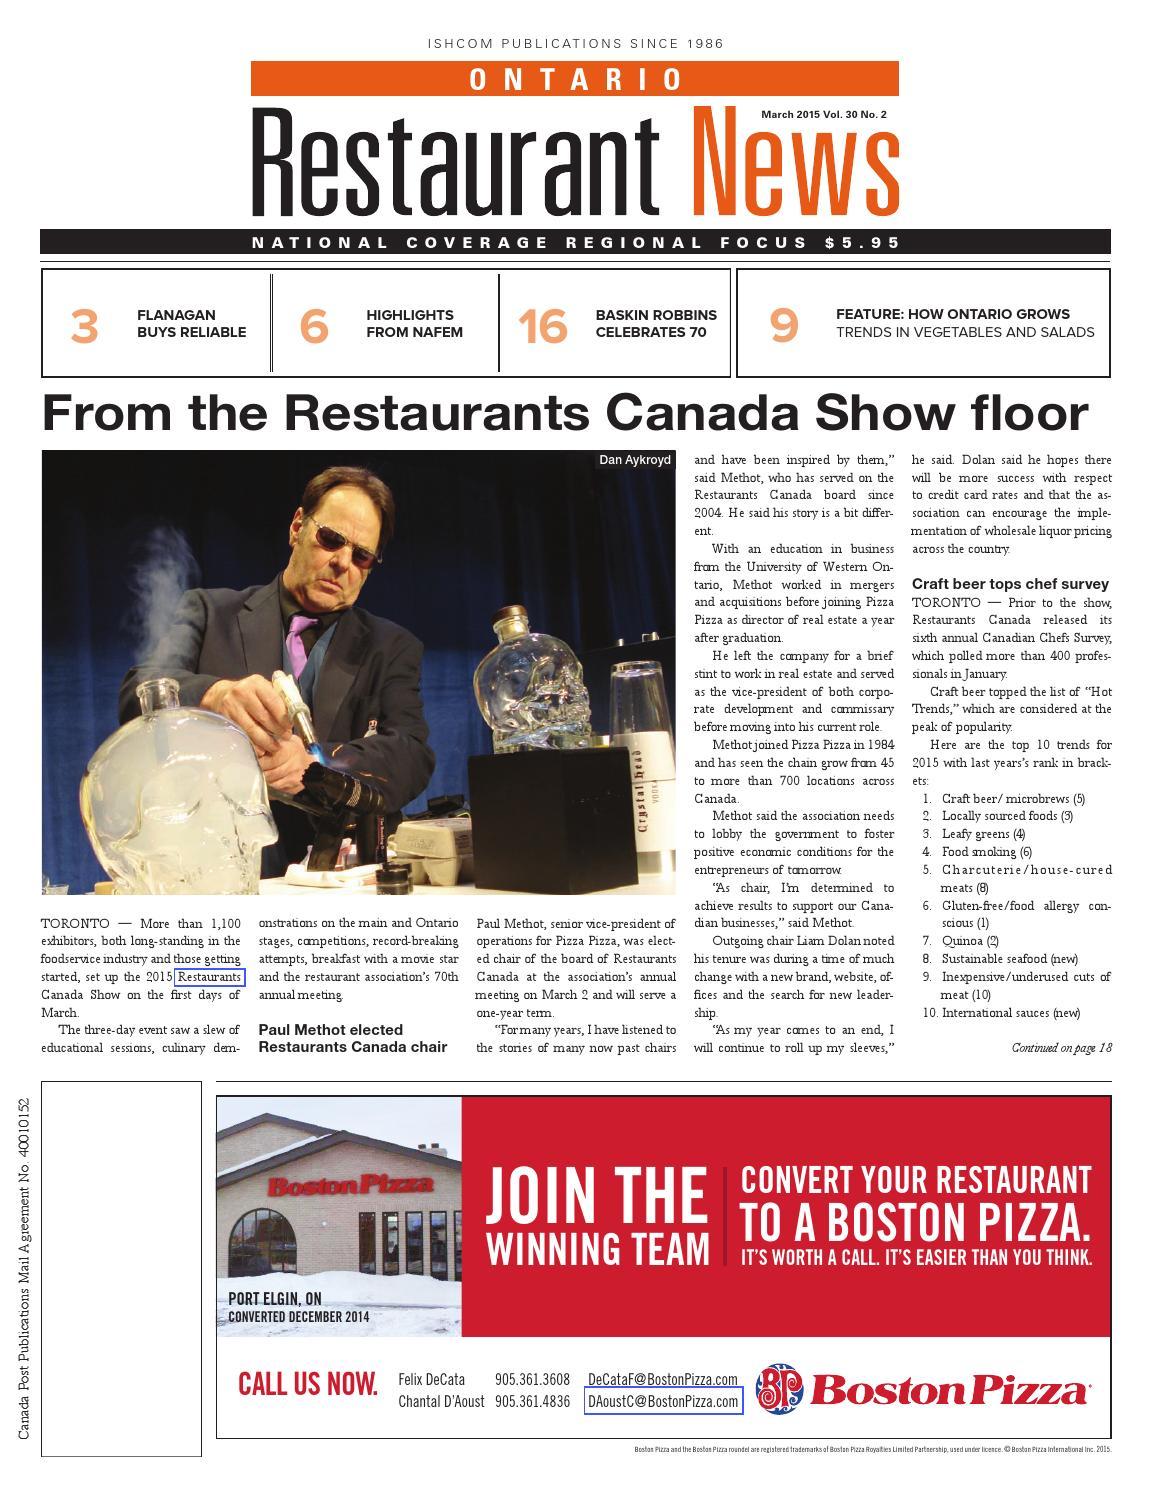 Ontario Restaurant News - March 2015 by Ishcom Publications - issuu